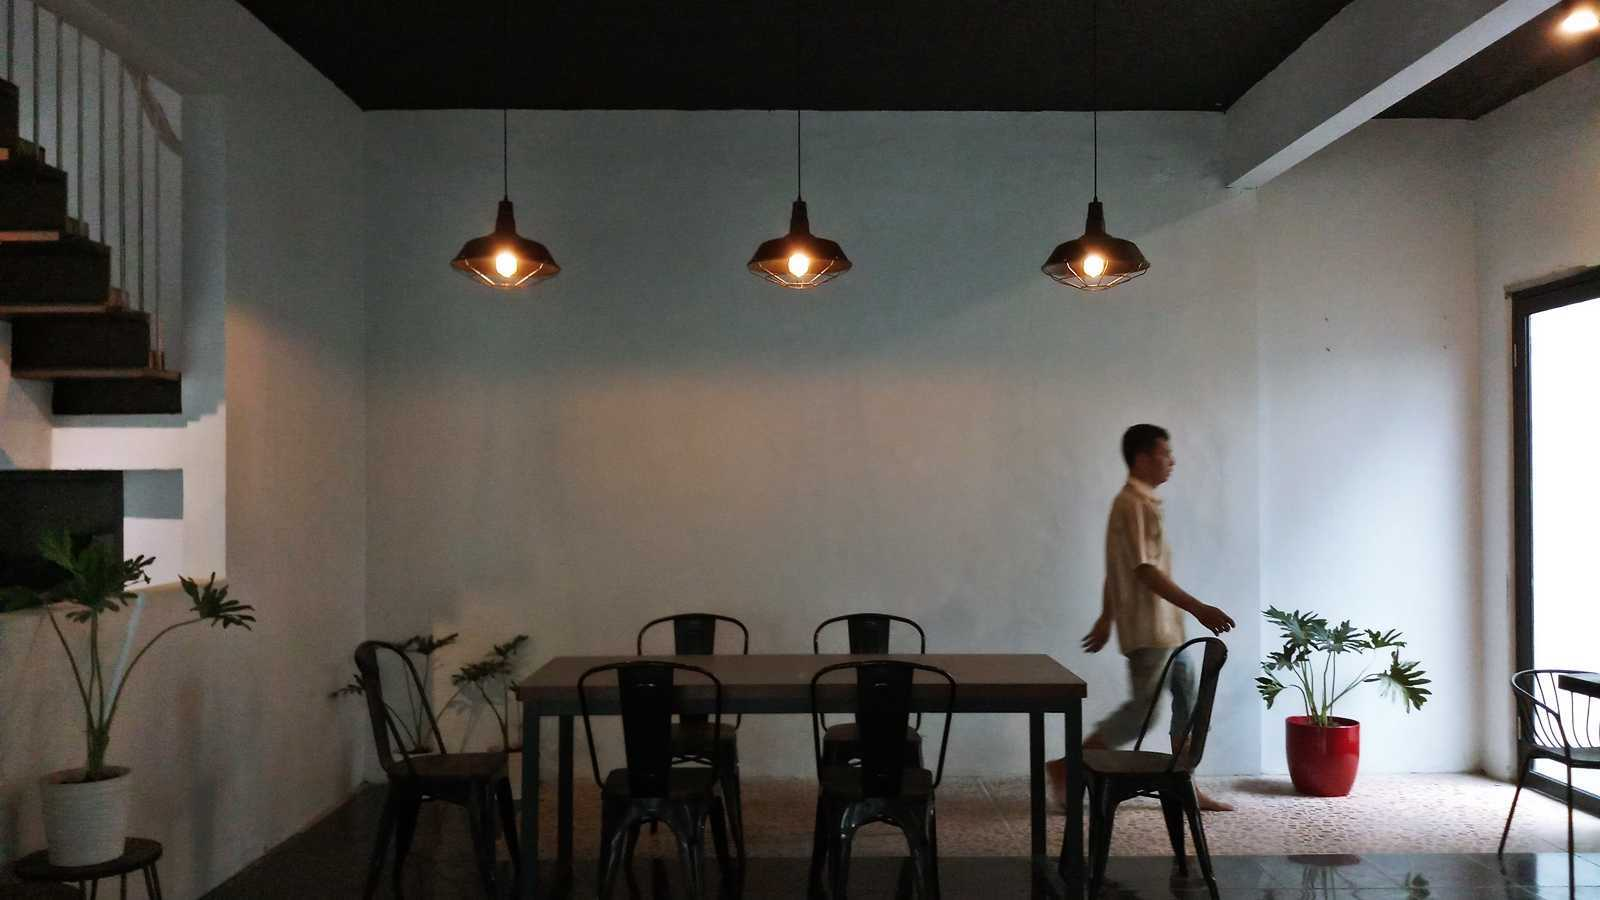 Bd Studio Tamoe Coffee & Resto Medan, Kota Medan, Sumatera Utara, Indonesia Medan, Kota Medan, Sumatera Utara, Indonesia Bd-Studio-Tamoe-Coffee-Resto   80745